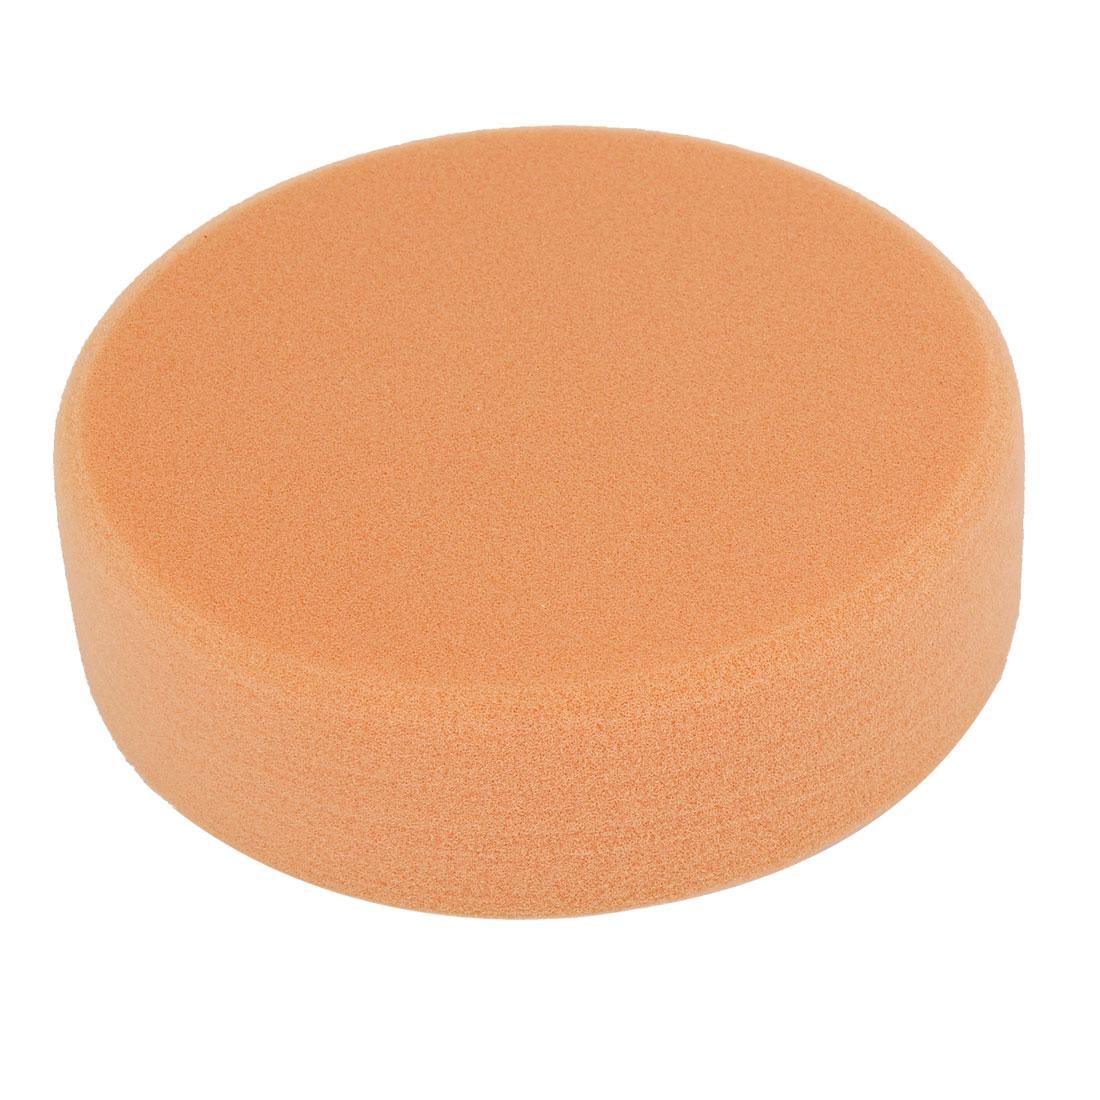 White Orange Sponge Round Sanding Polishing Pad 150mm x 40mm